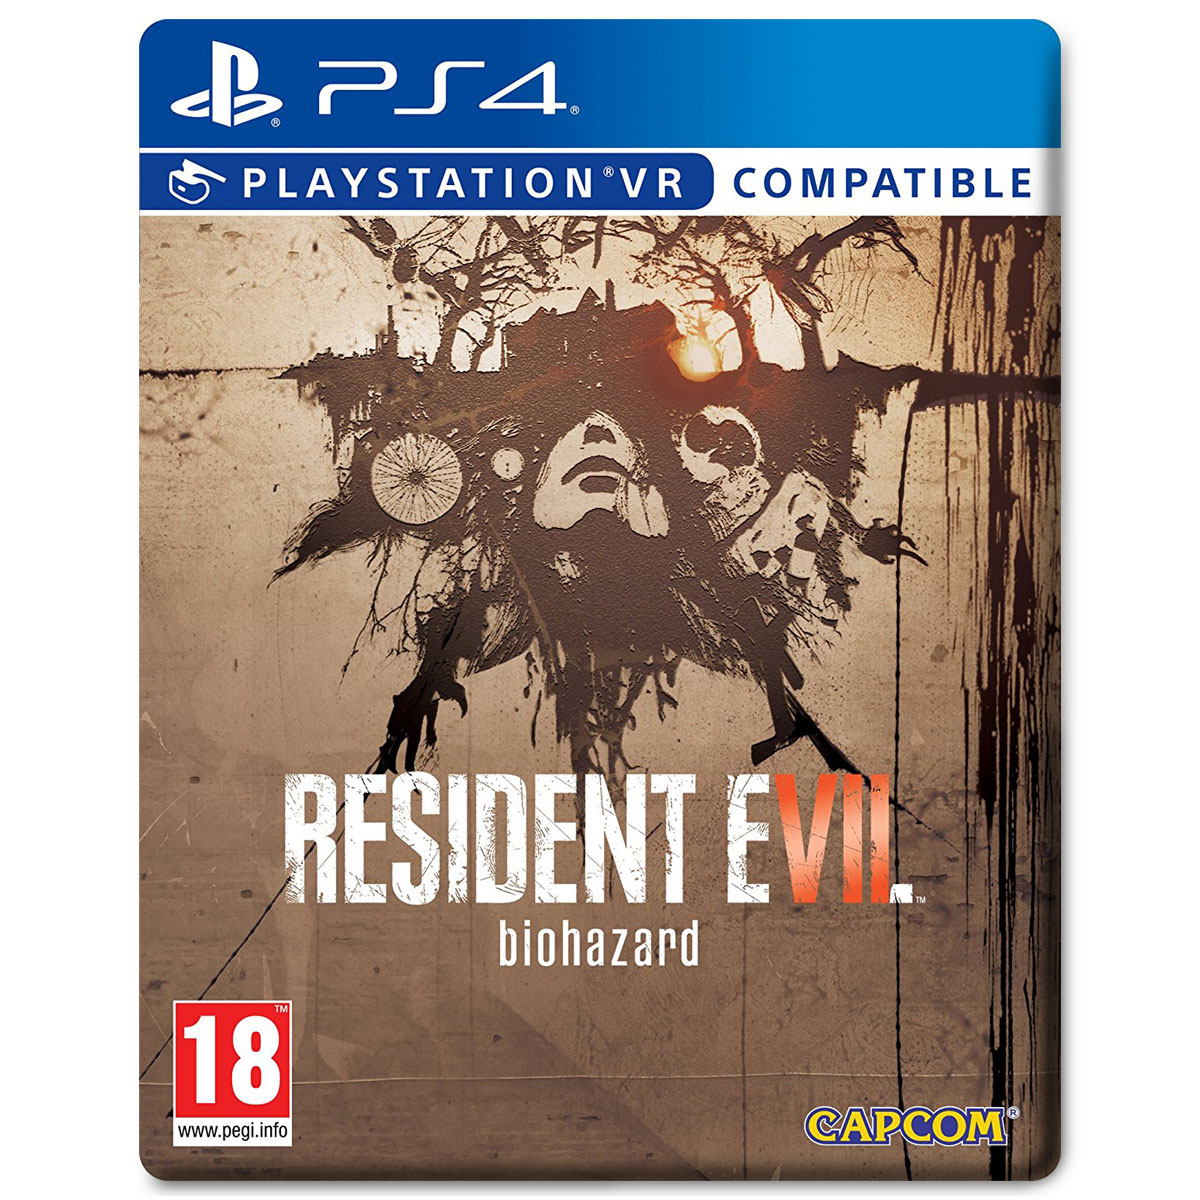 Jeux PS4 Resident Evil VII : Biohazard - Steelbook Edition (PS4) Resident Evil VII : Biohazard - Steelbook Edition (PS4)